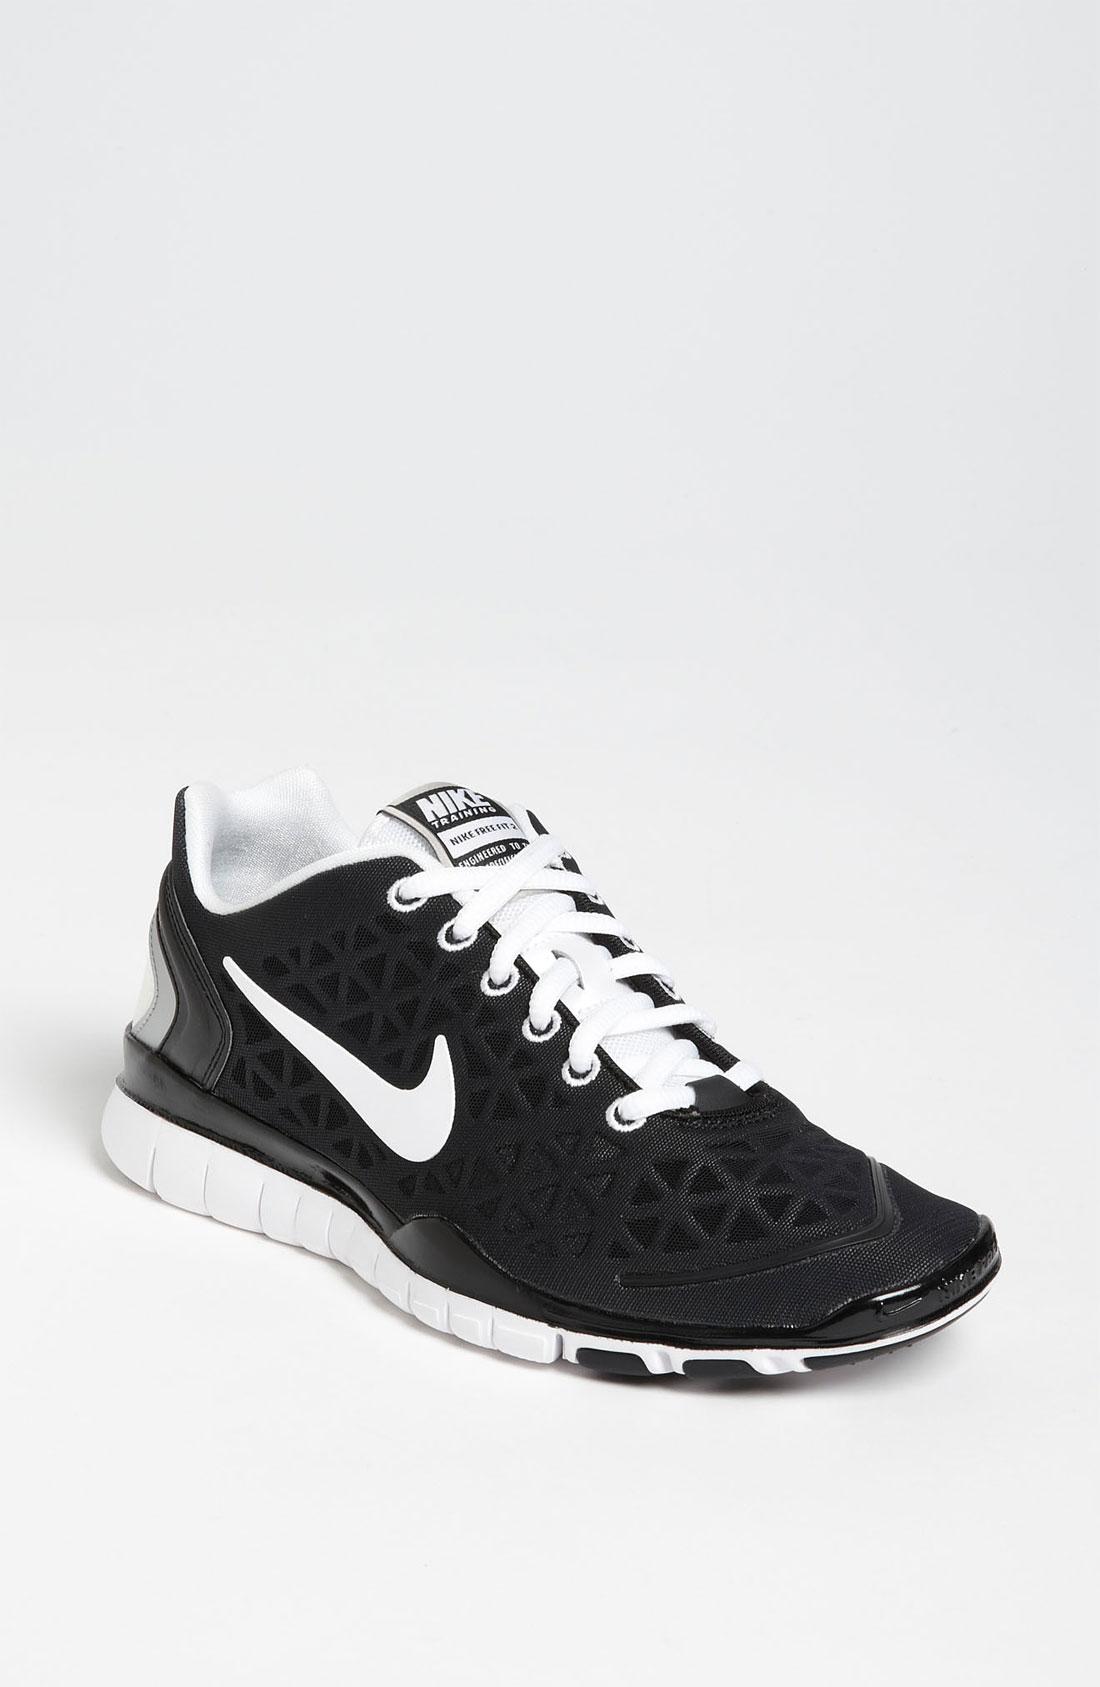 Nike Free Tr Fit 2 Training Shoes Womens